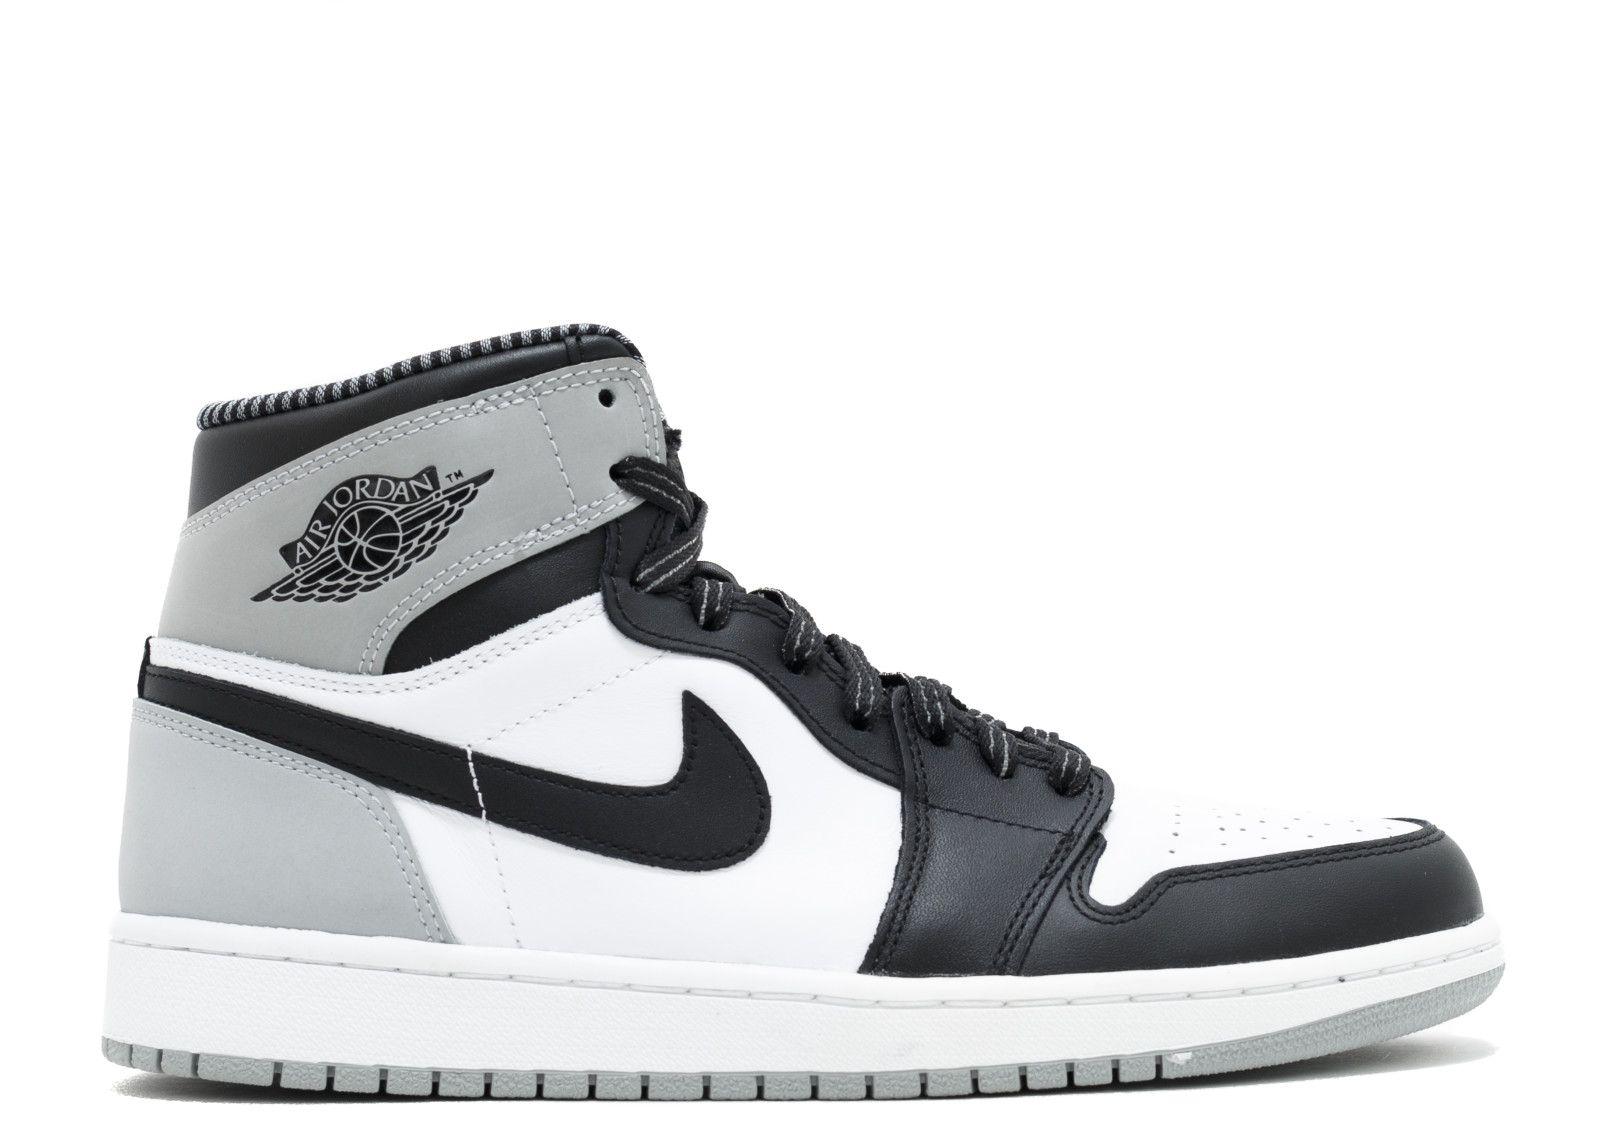 Air Jordan 1 Retro High OG 'Barons